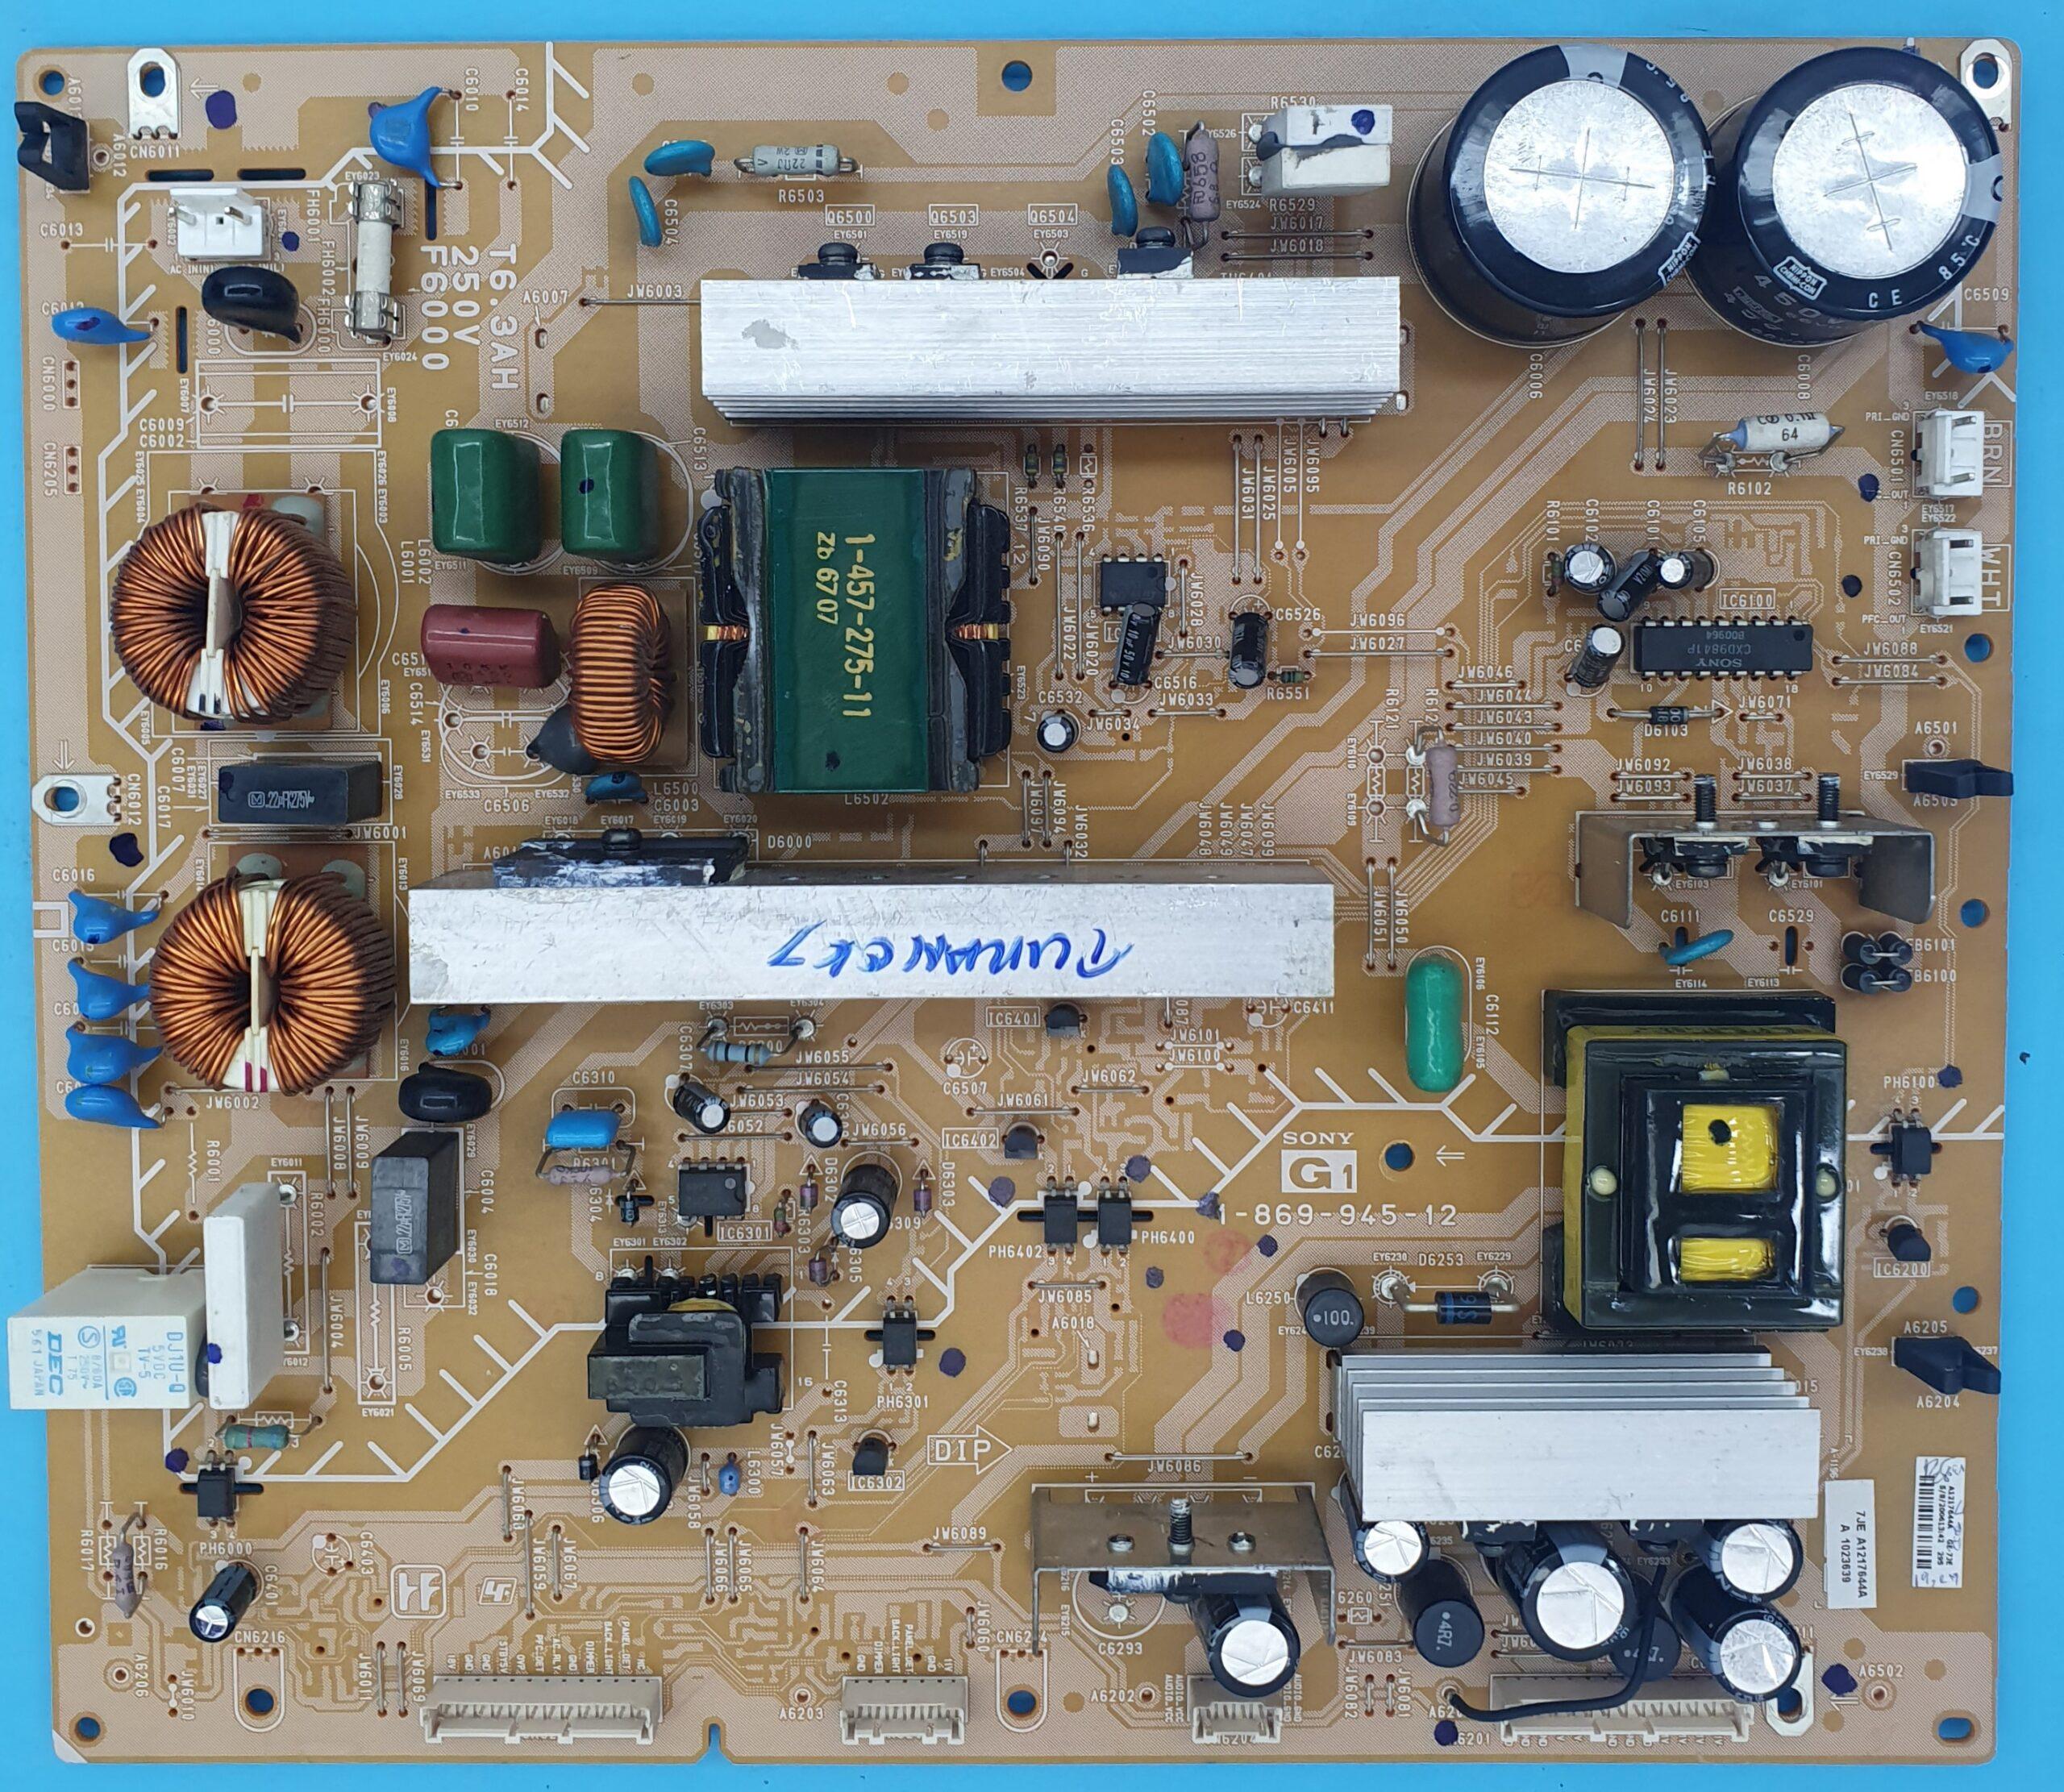 1-869-945-12 Sony Power (KDV DAHİL = 130 TL)